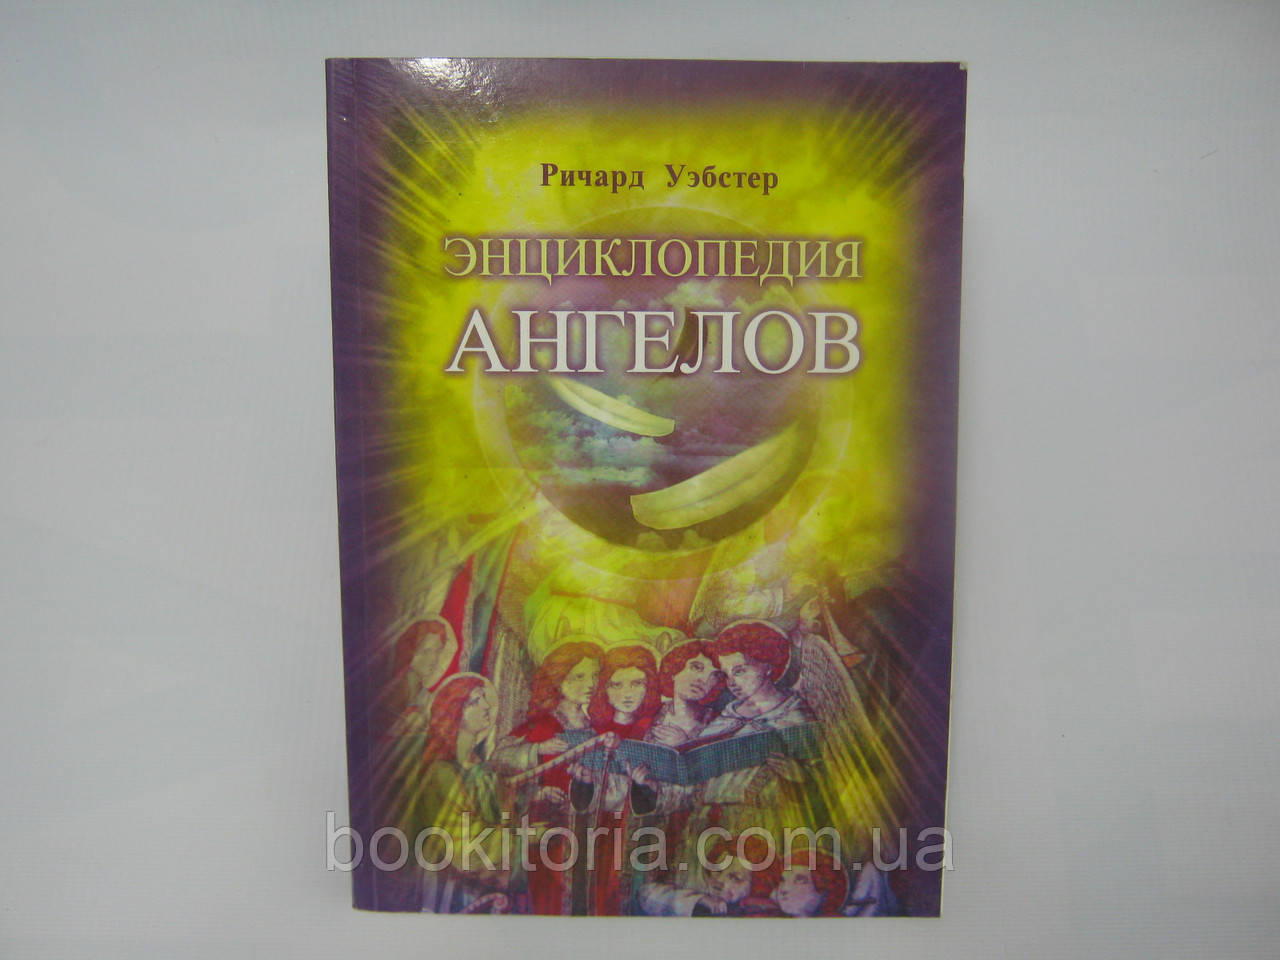 Уэбстер Р. Энциклопедия ангелов (б/у).